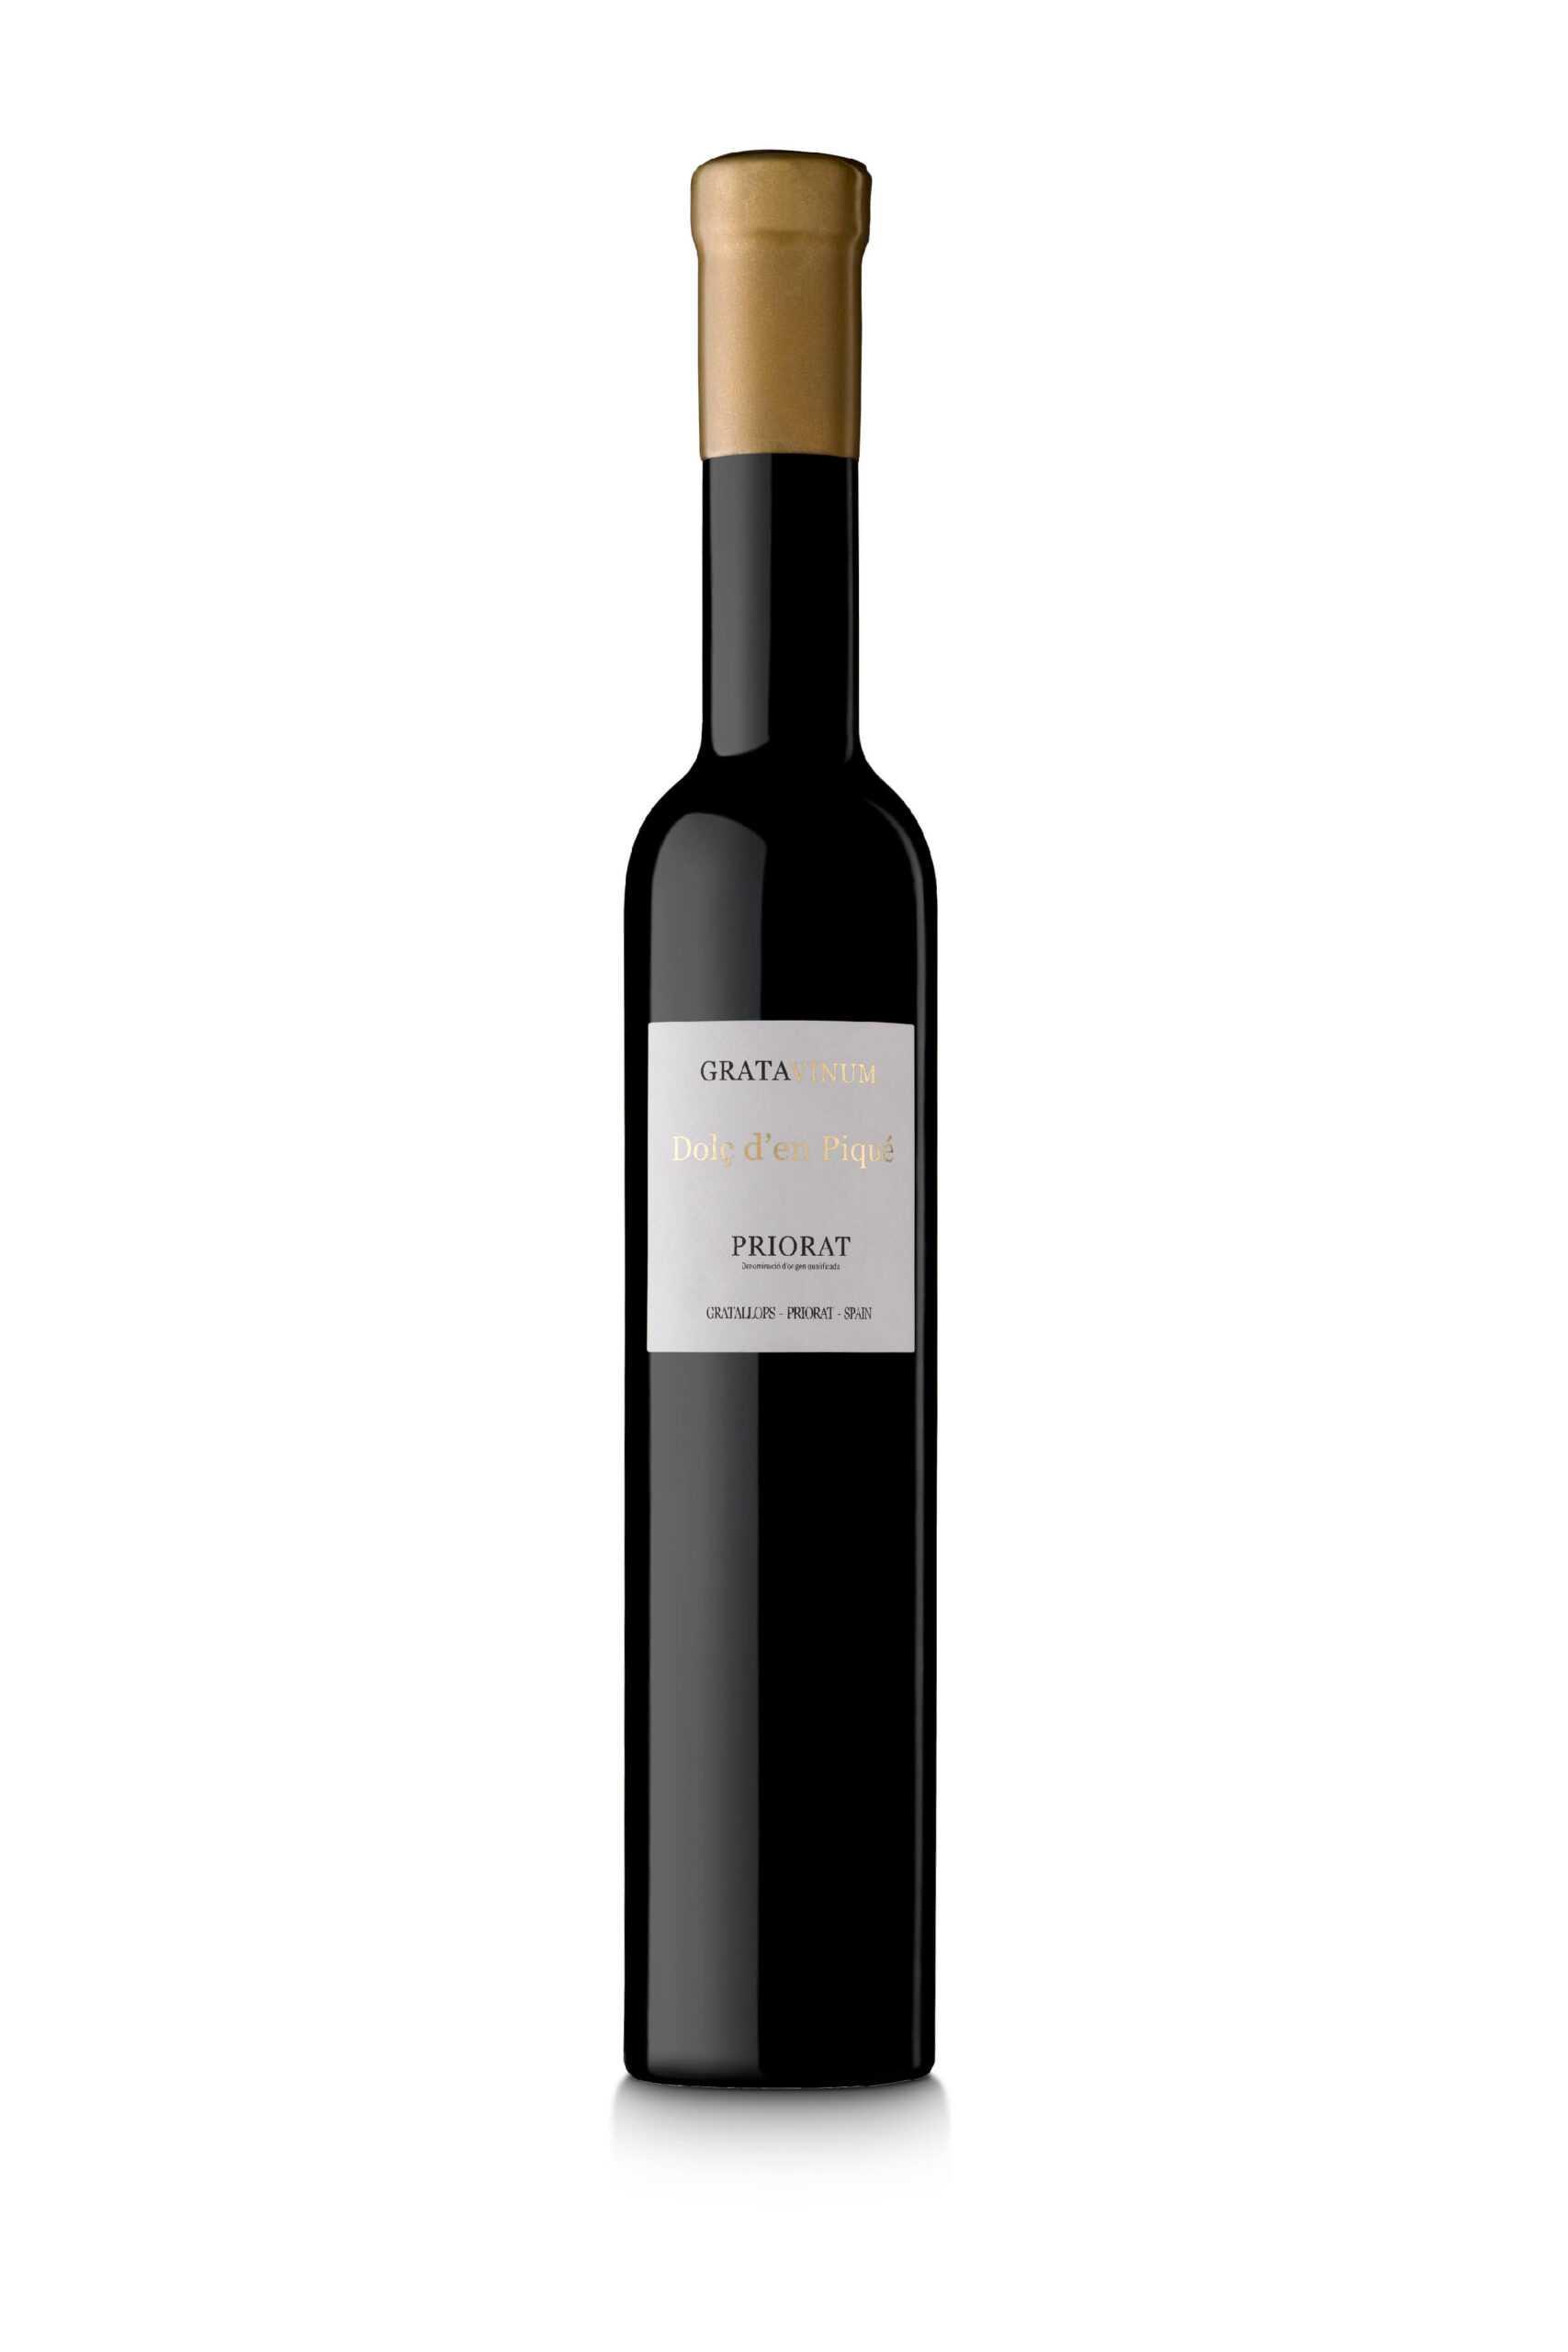 Dolç d'en Piqué 2017 vino dolc den pique gratavinum priorat scaled